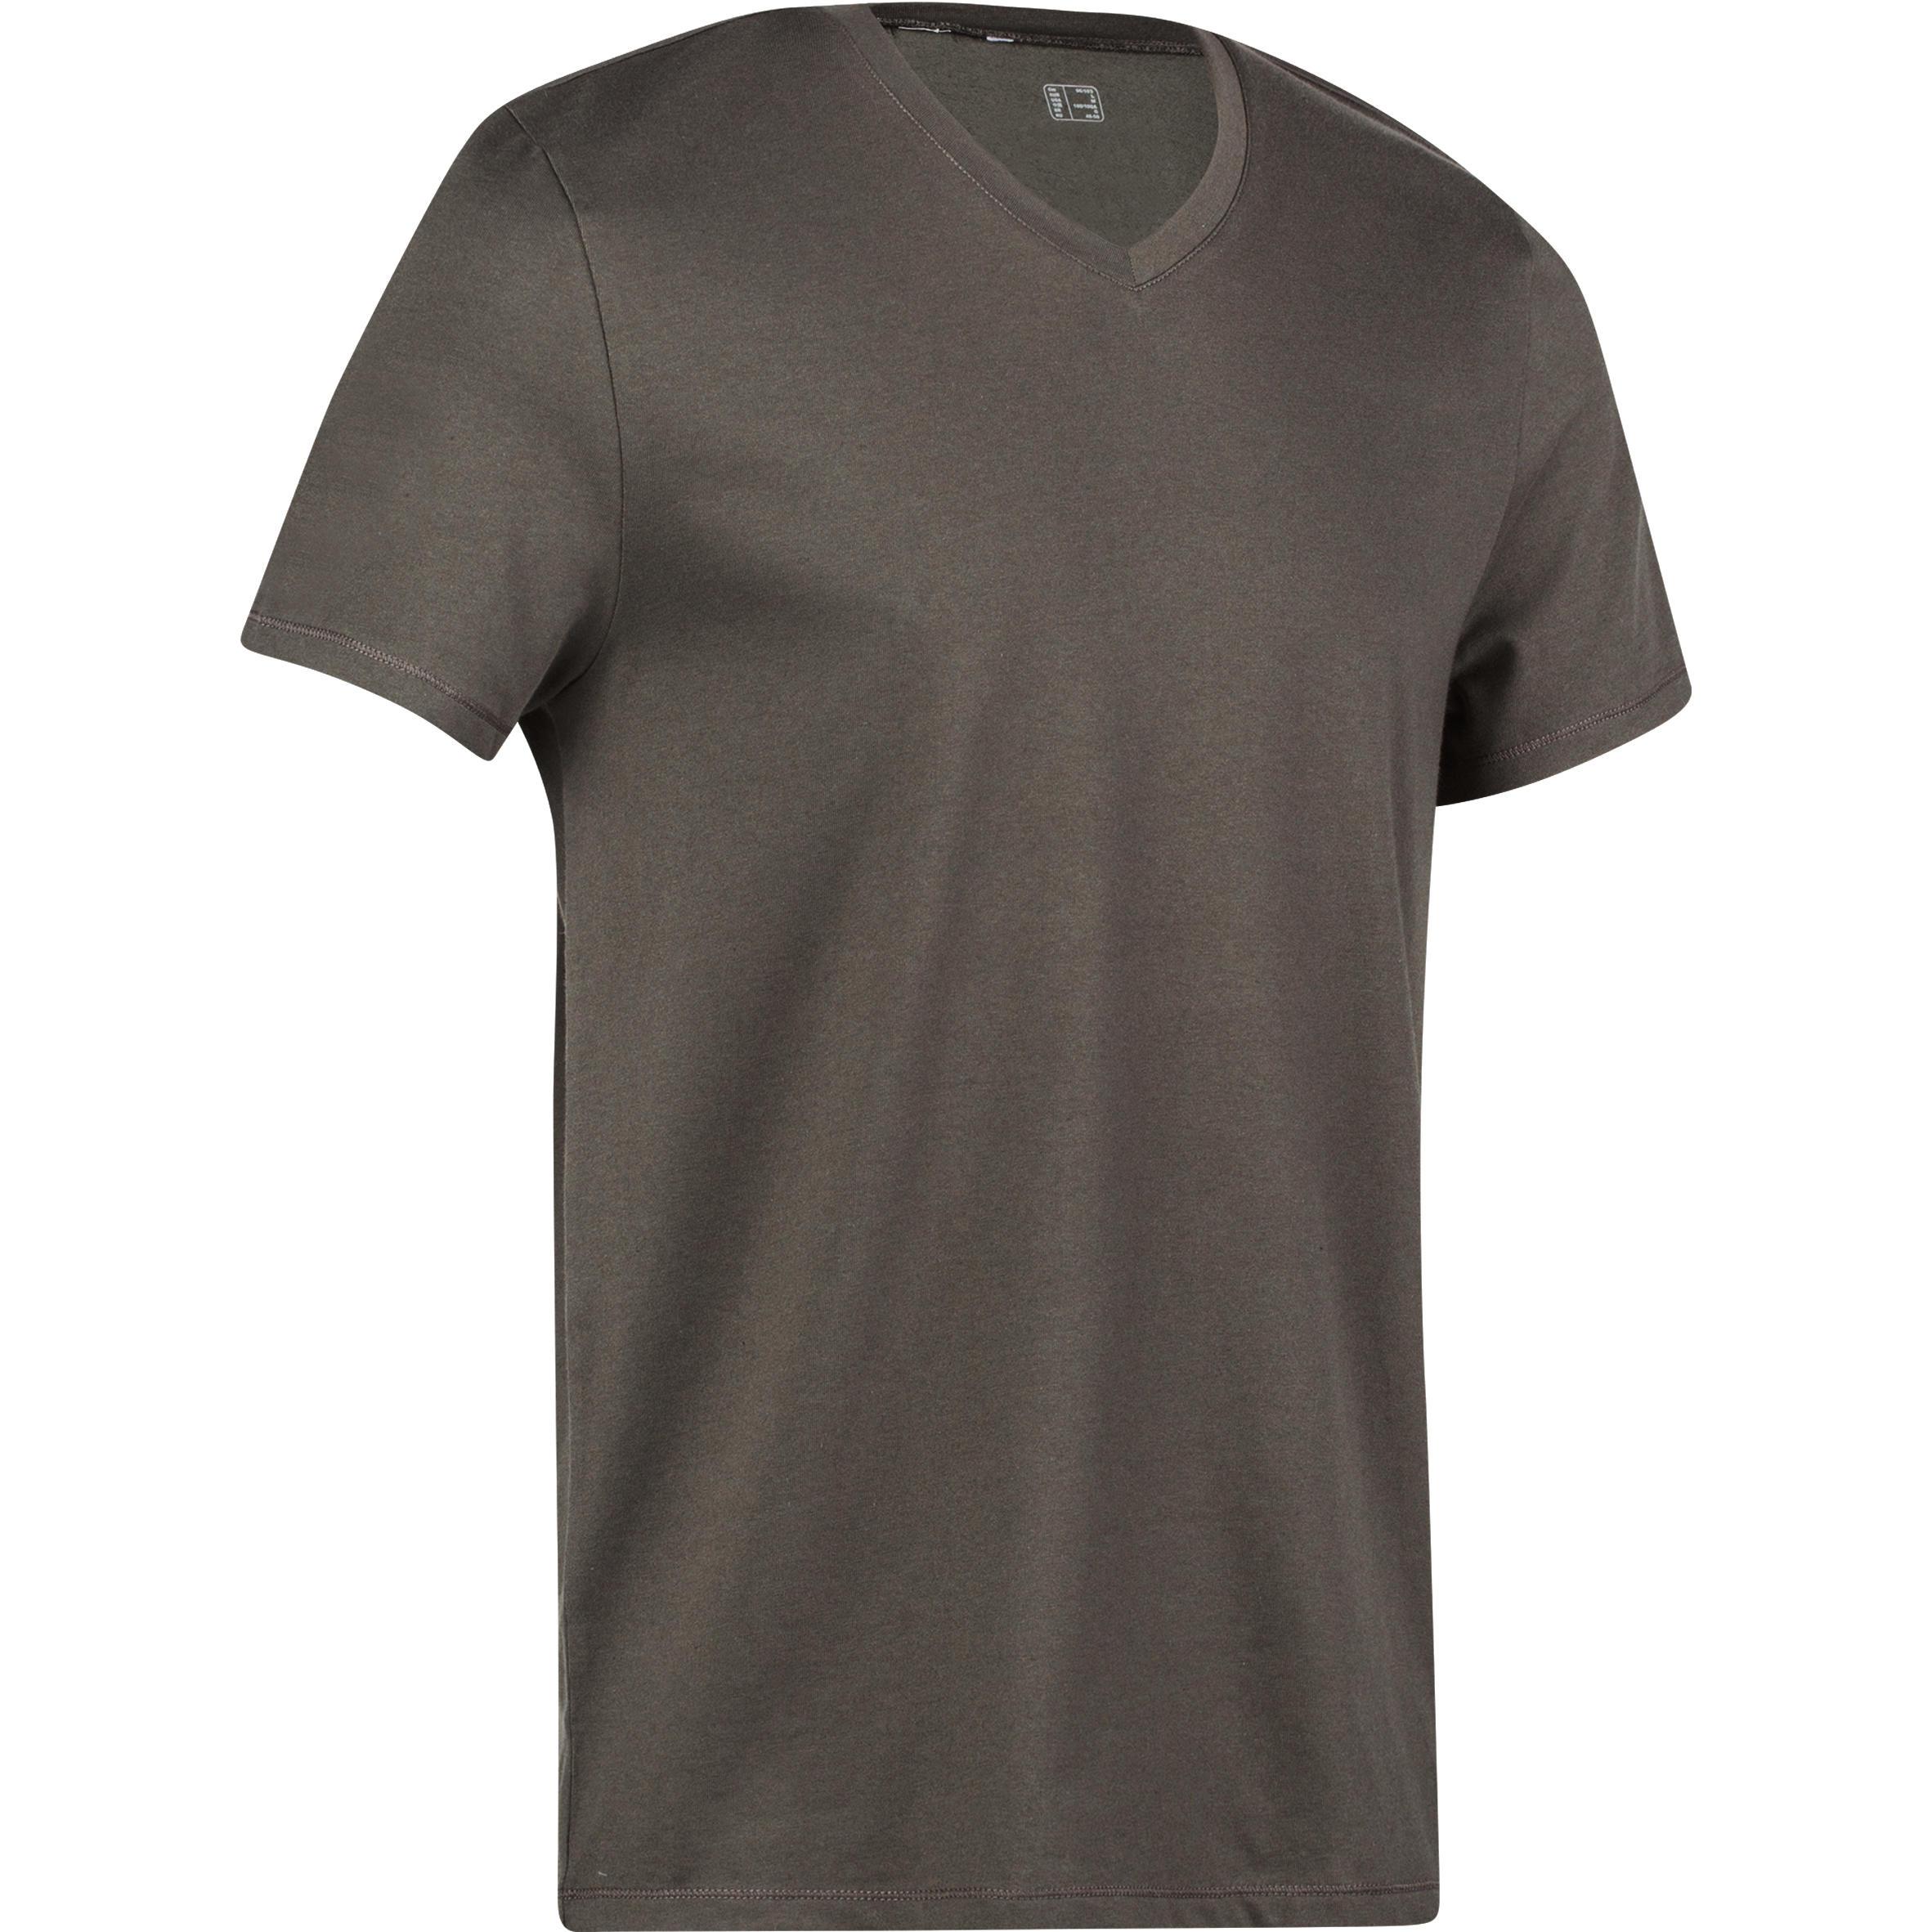 Domyos Heren T-shirt 500 Gym & Pilates slim V hals